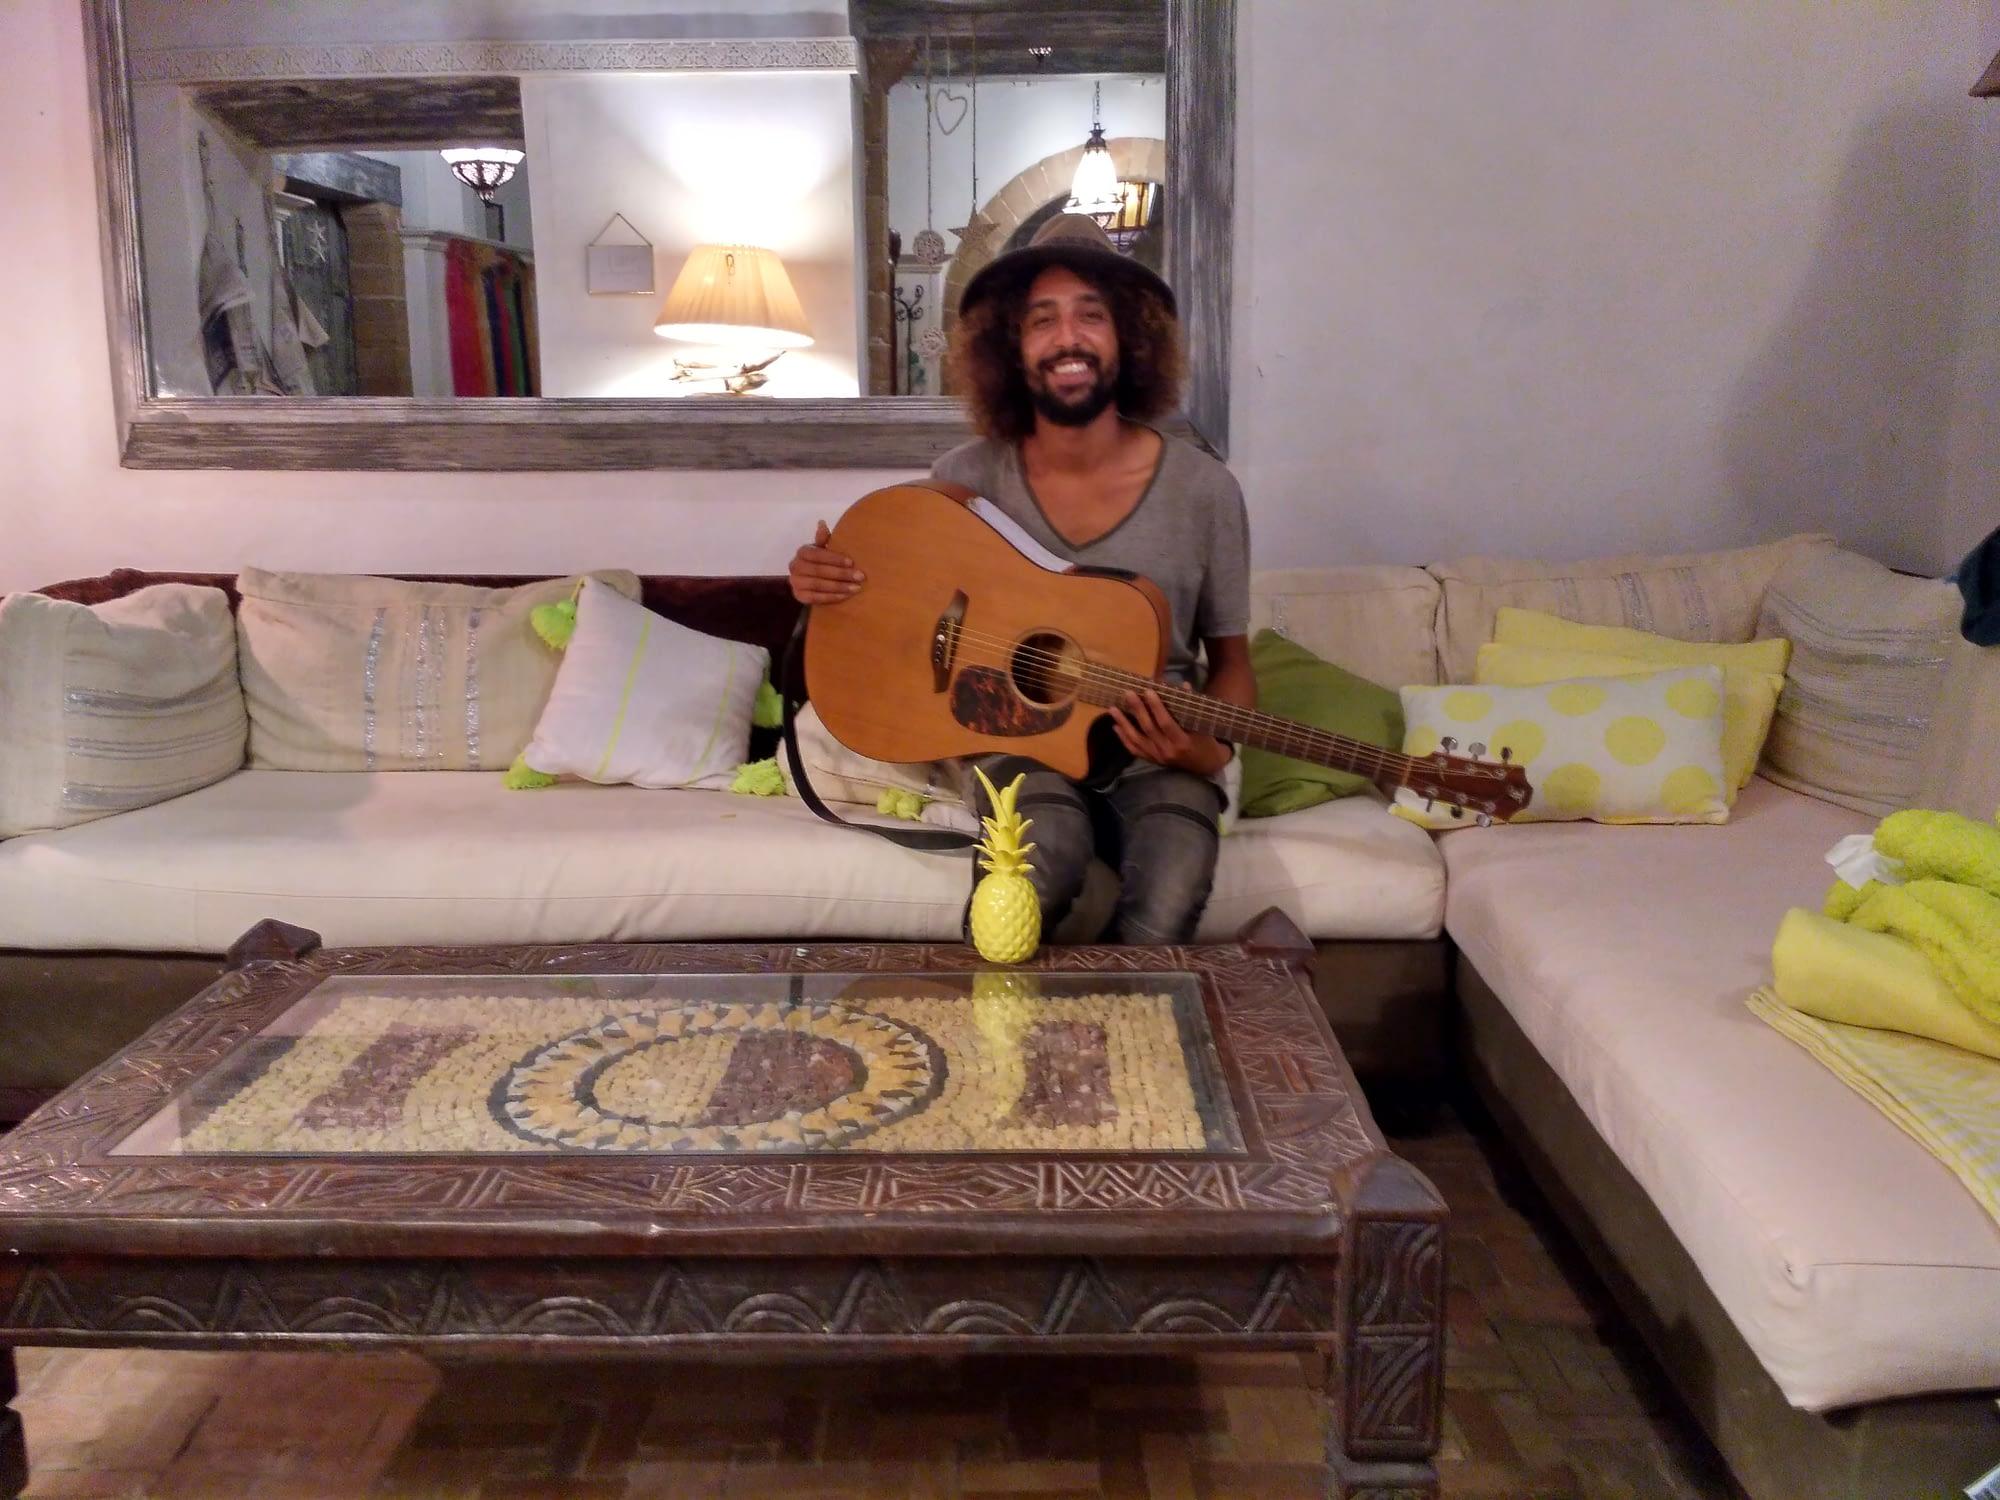 simo curly singer songwriter